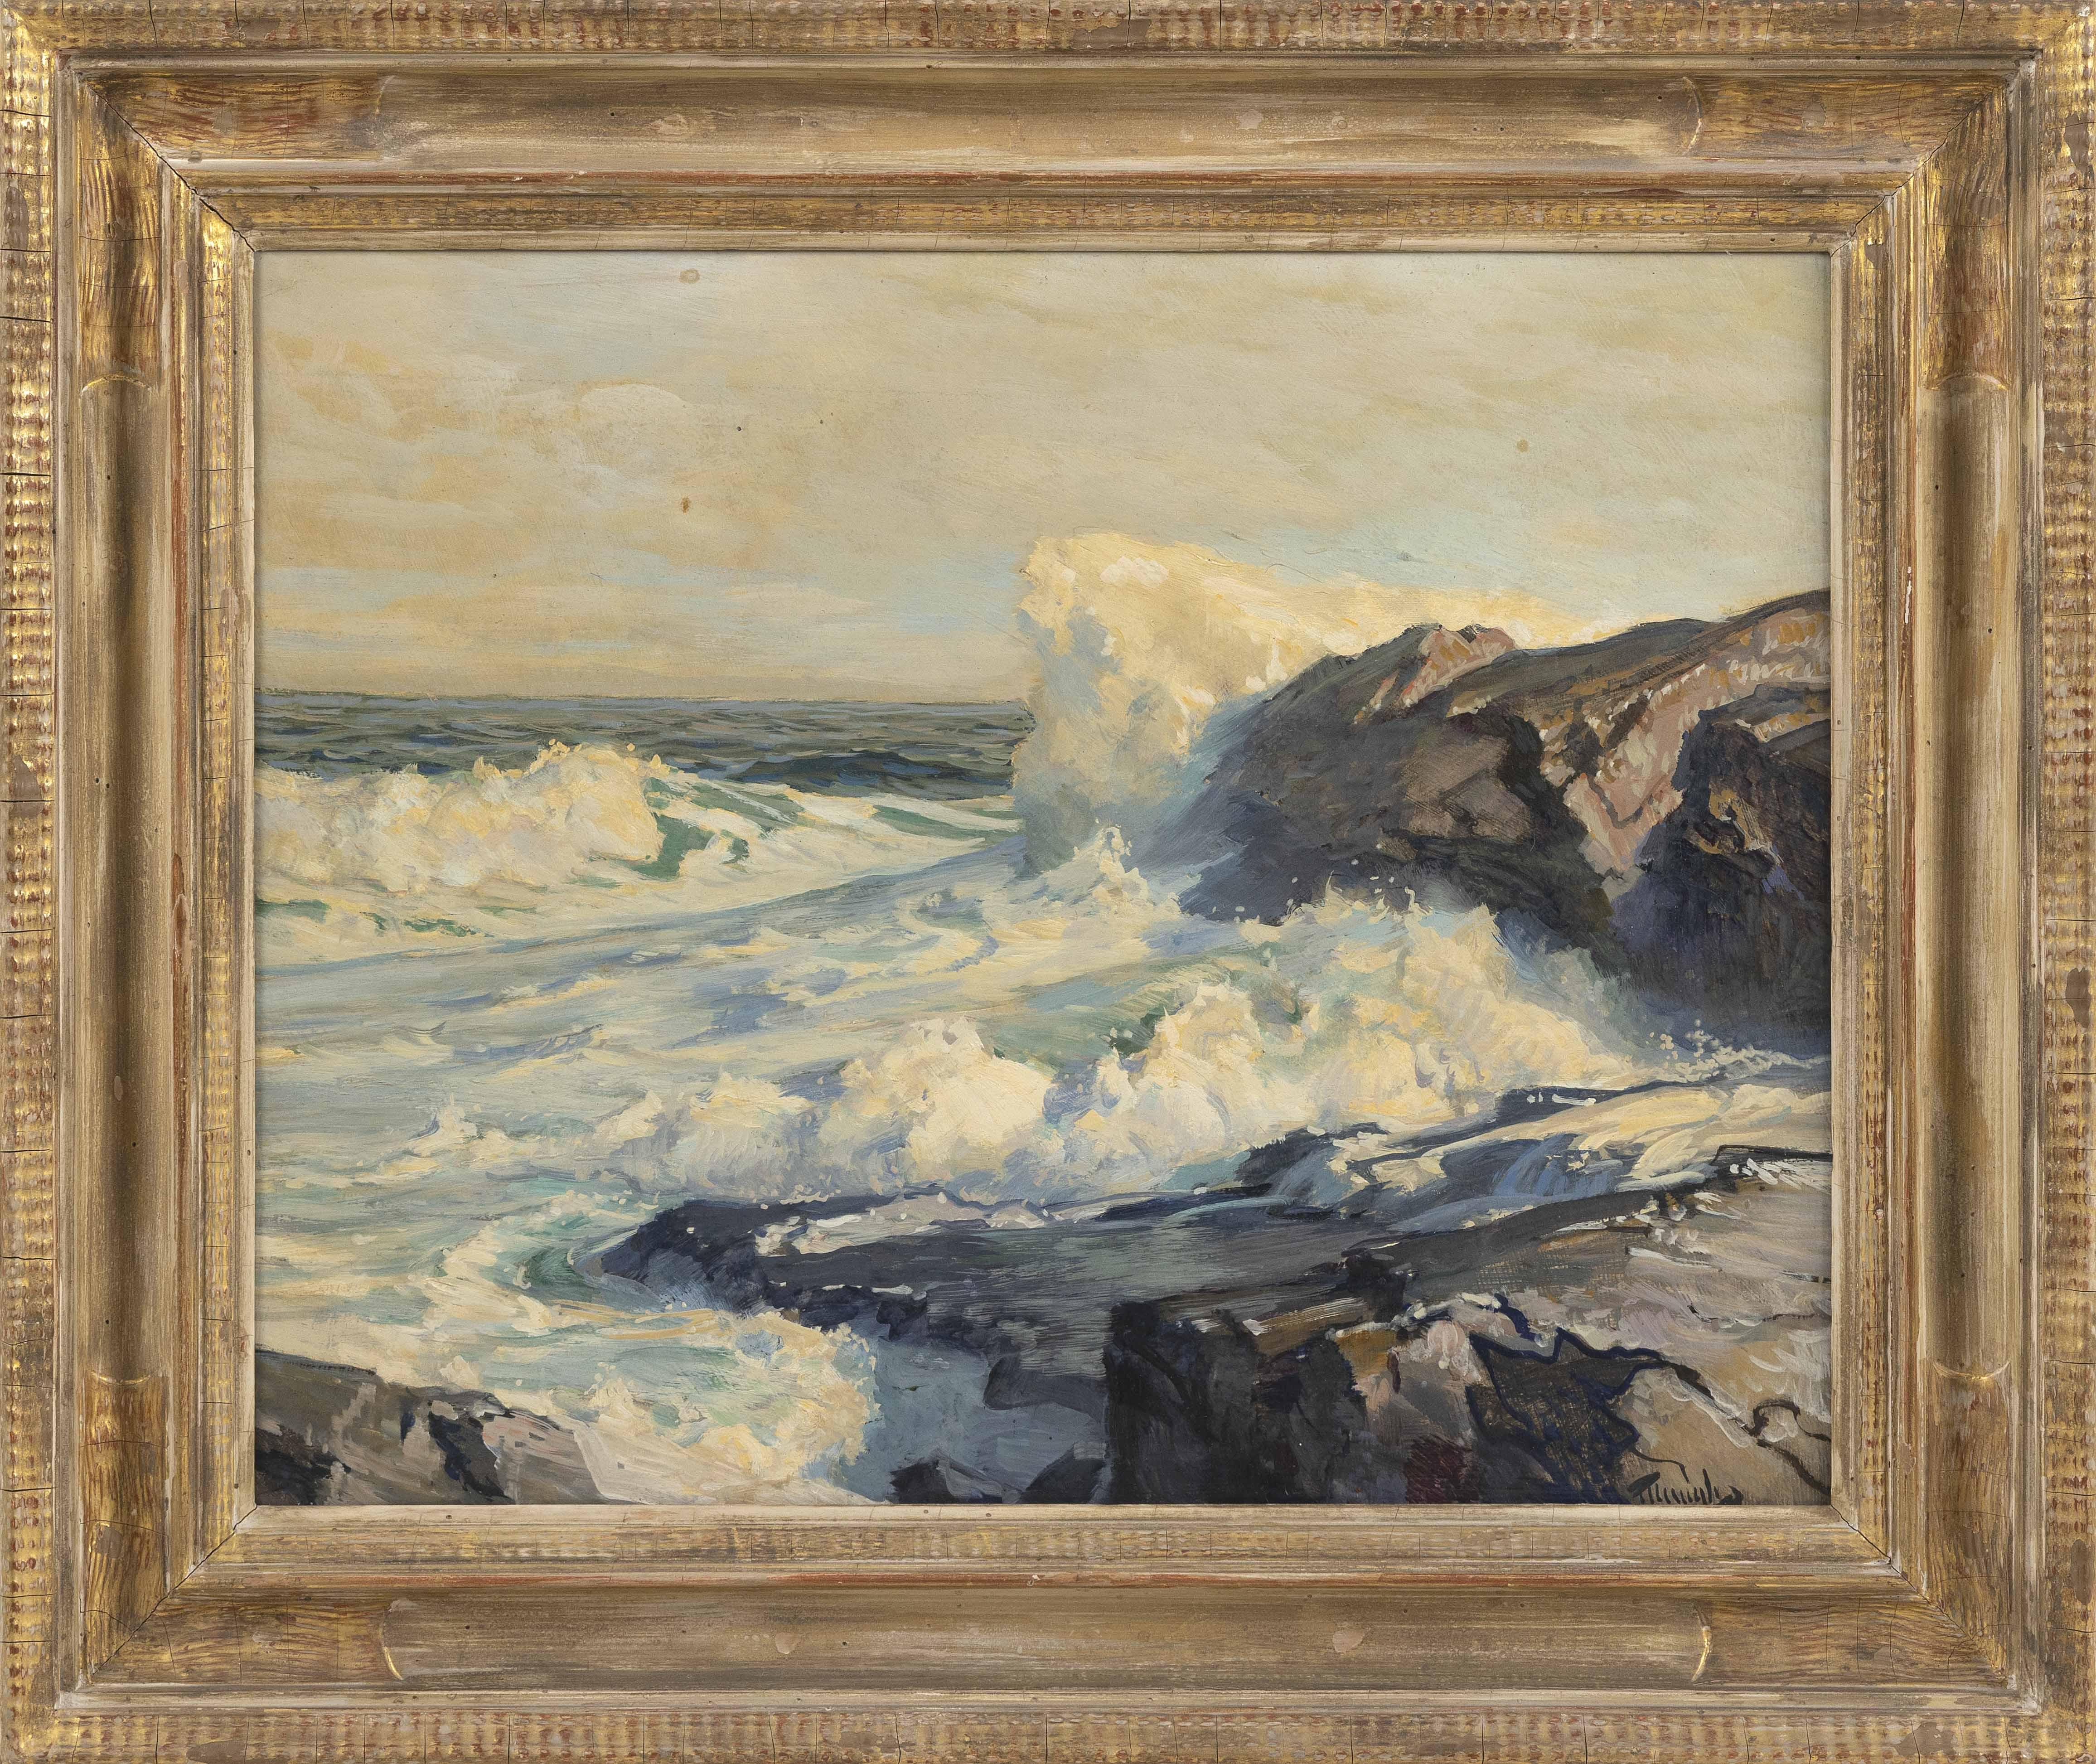 FREDERICK JUDD WAUGH (New York/Massachusetts, 1861-1940), Crashing waves., Oil on board, 16